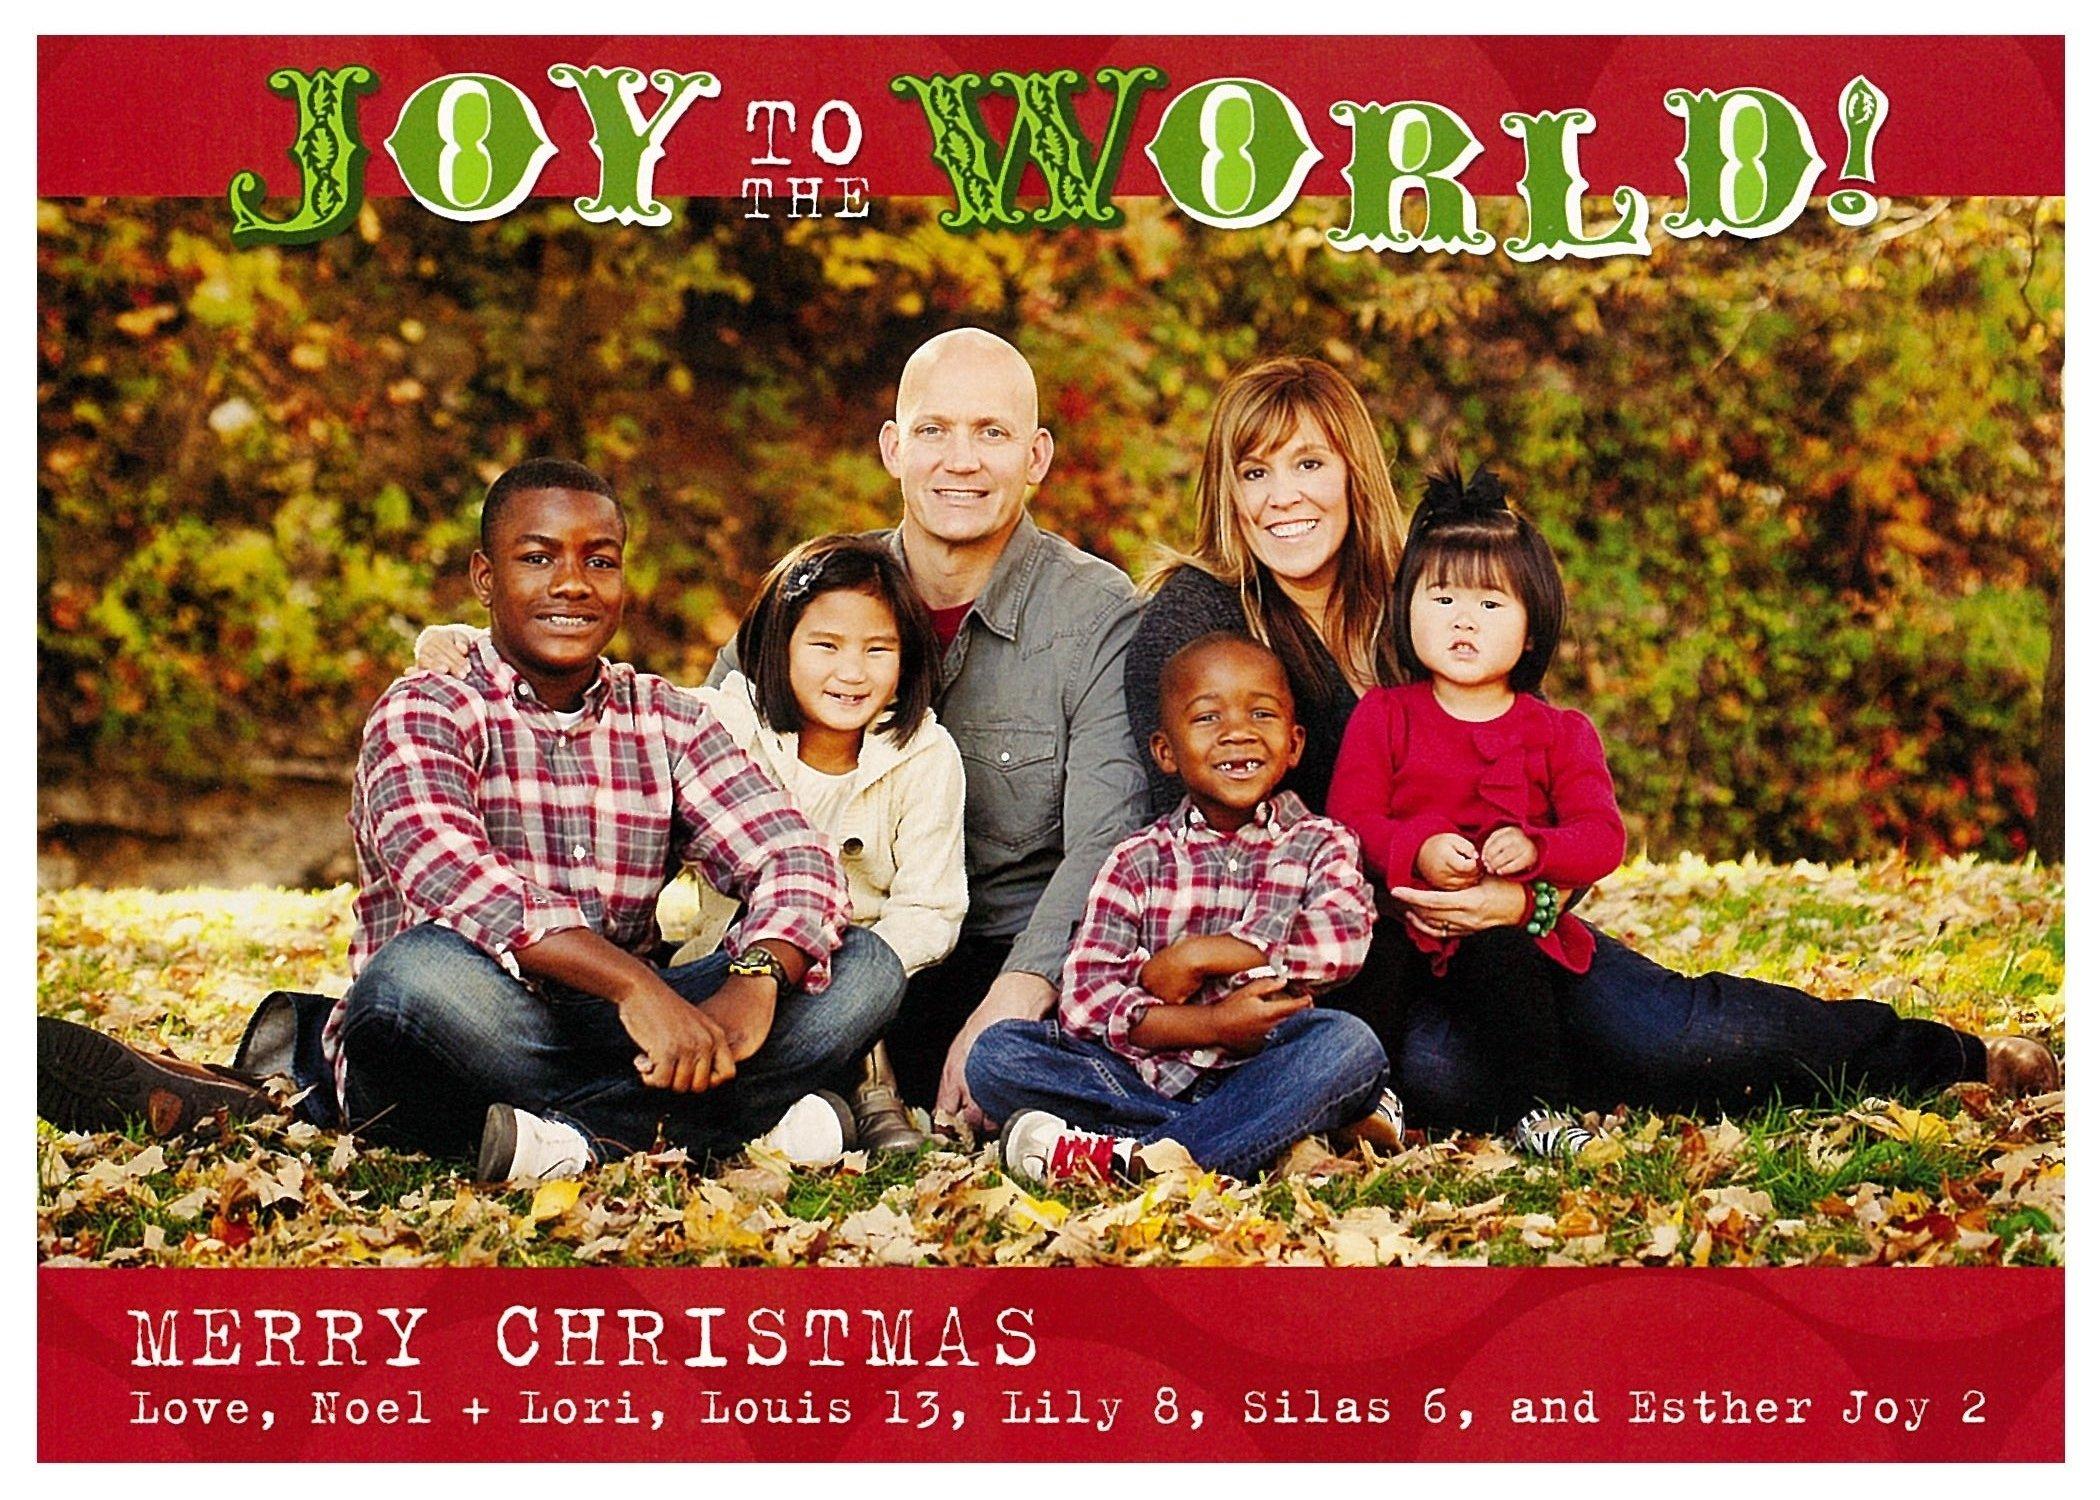 10 Beautiful Best Christmas Card Photo Ideas christmas cards families outreach home art decor 55978 1 2020